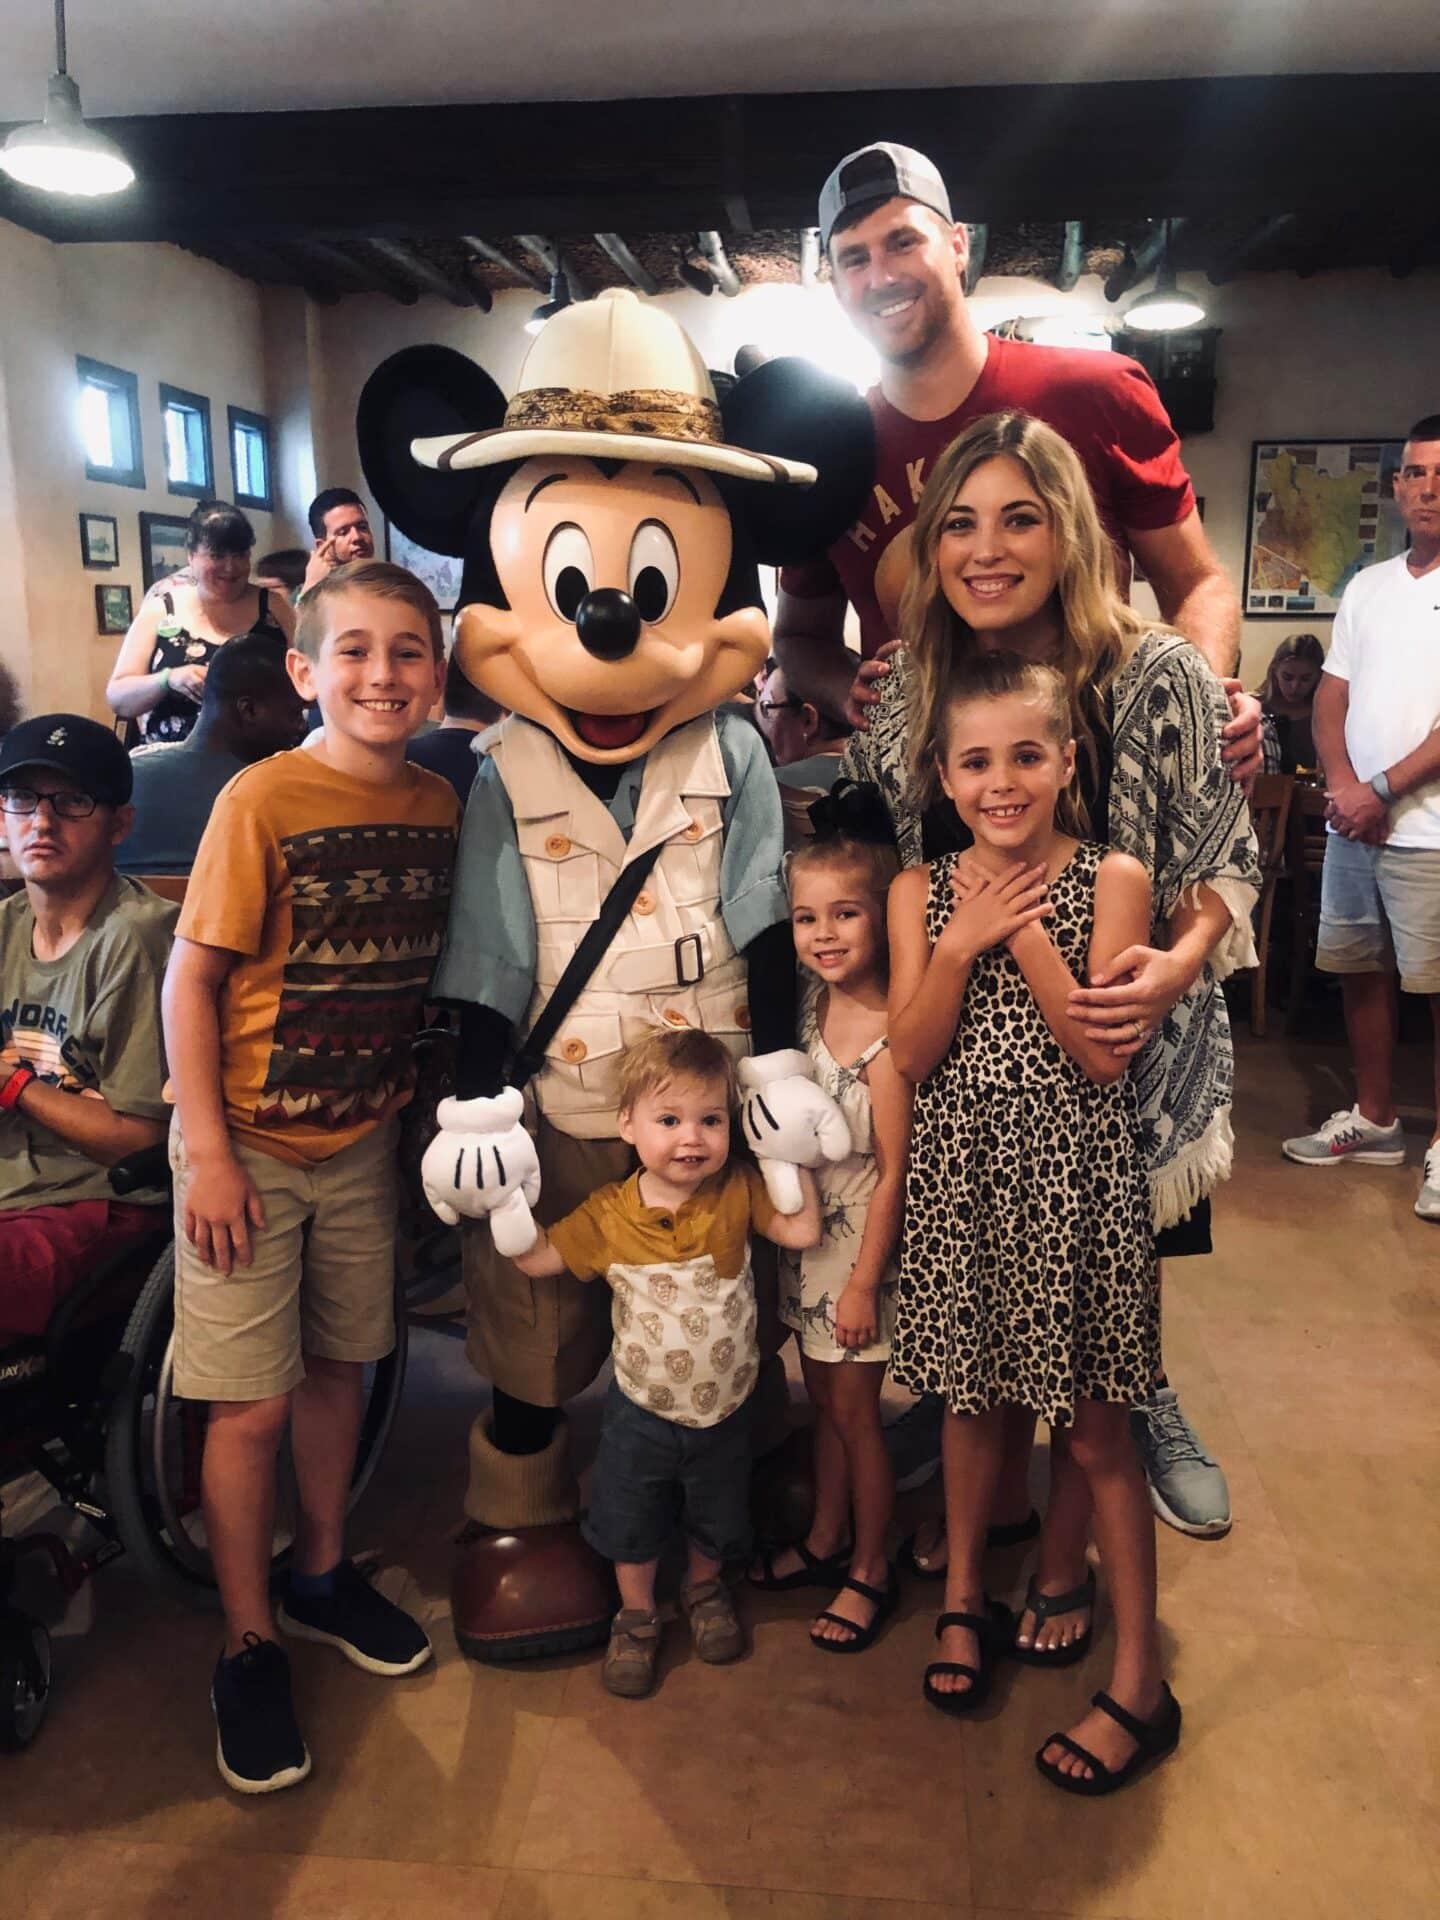 Tess's 5th Bday at Disney: Animal Kingdom and Disney Springs